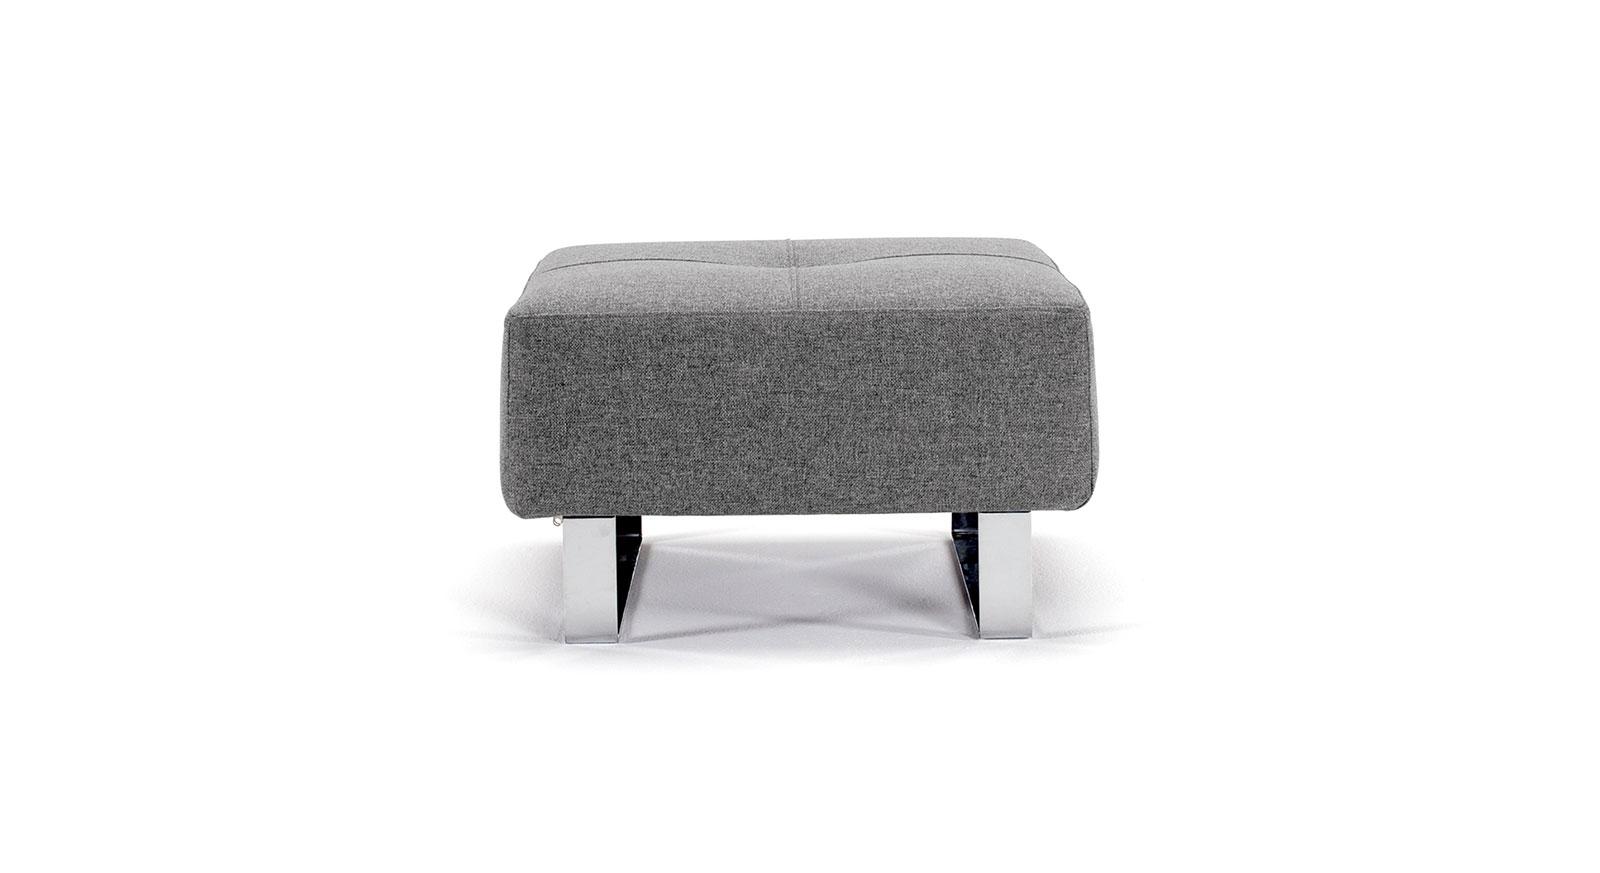 Sitzhocker Wilshere in grau mit verchromten Füßen.